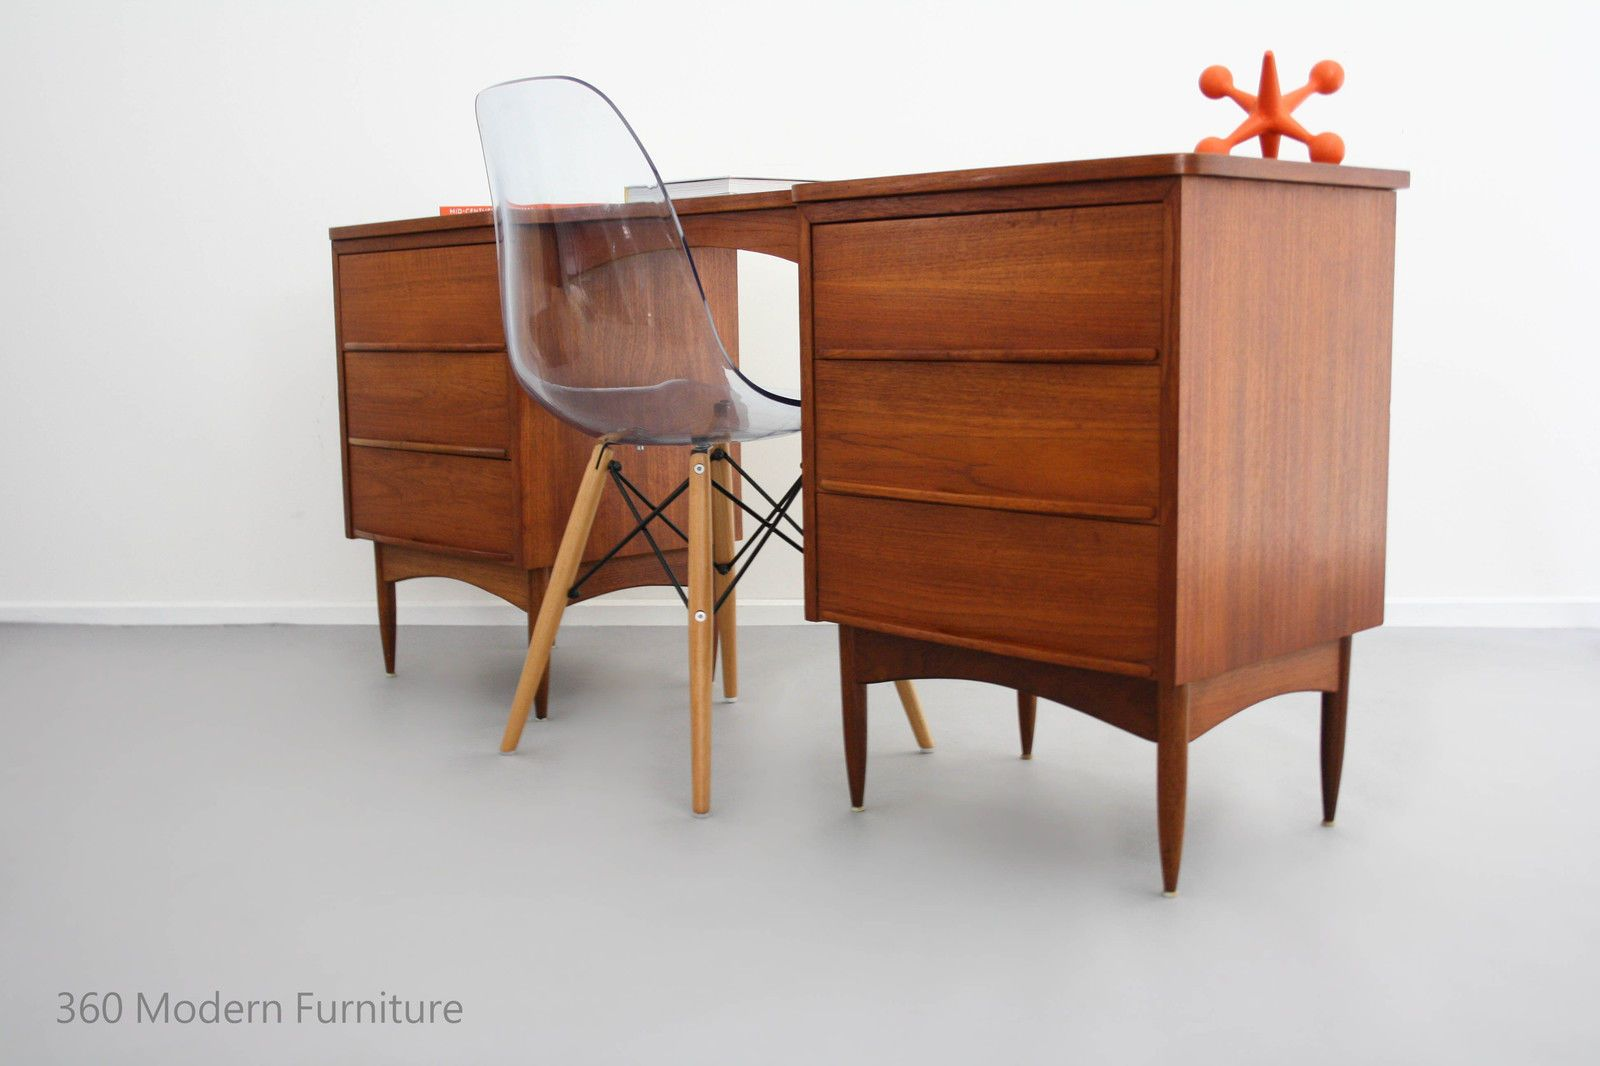 Mid Century Modern Desk Table Drawers Console Vintage Retro Sideboard Scandi Mid Century Modern Desk Retro Furniture Furniture